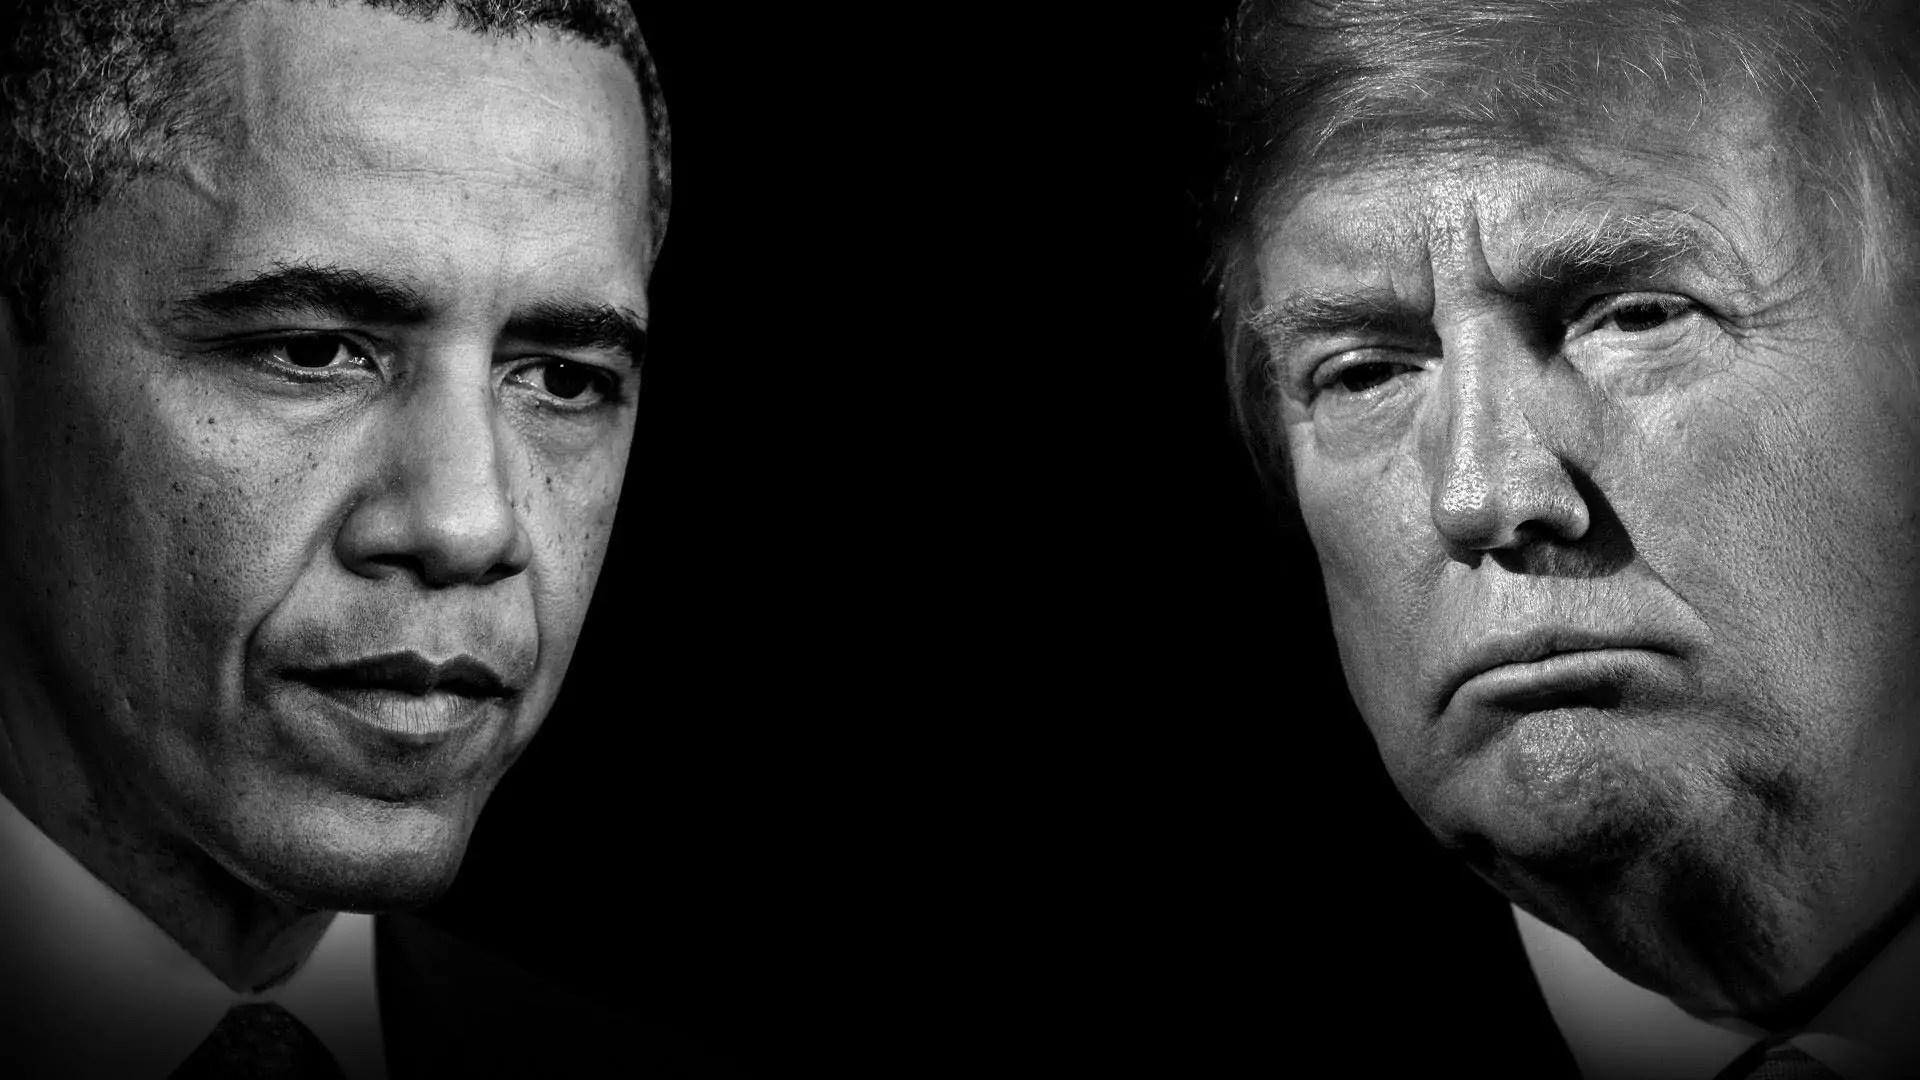 Composite of portraits of Barack Obama and Donald Trump.